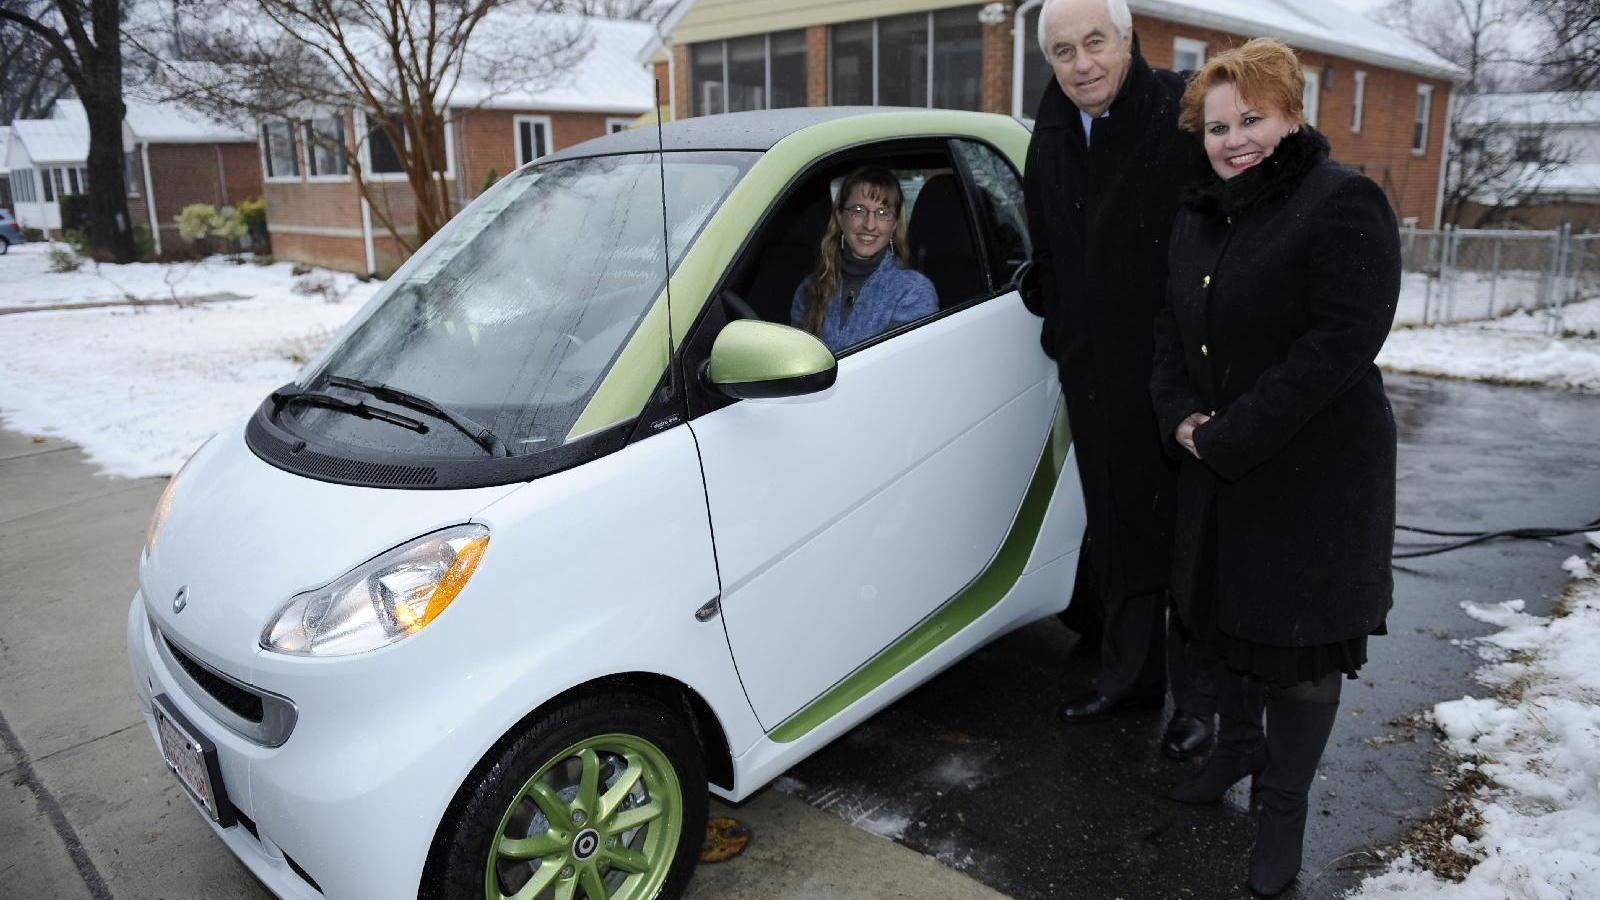 First Smart ForTwo Electric Drive with Roger Penske and Smart USA president Jill Lajdziak, Jan 2011